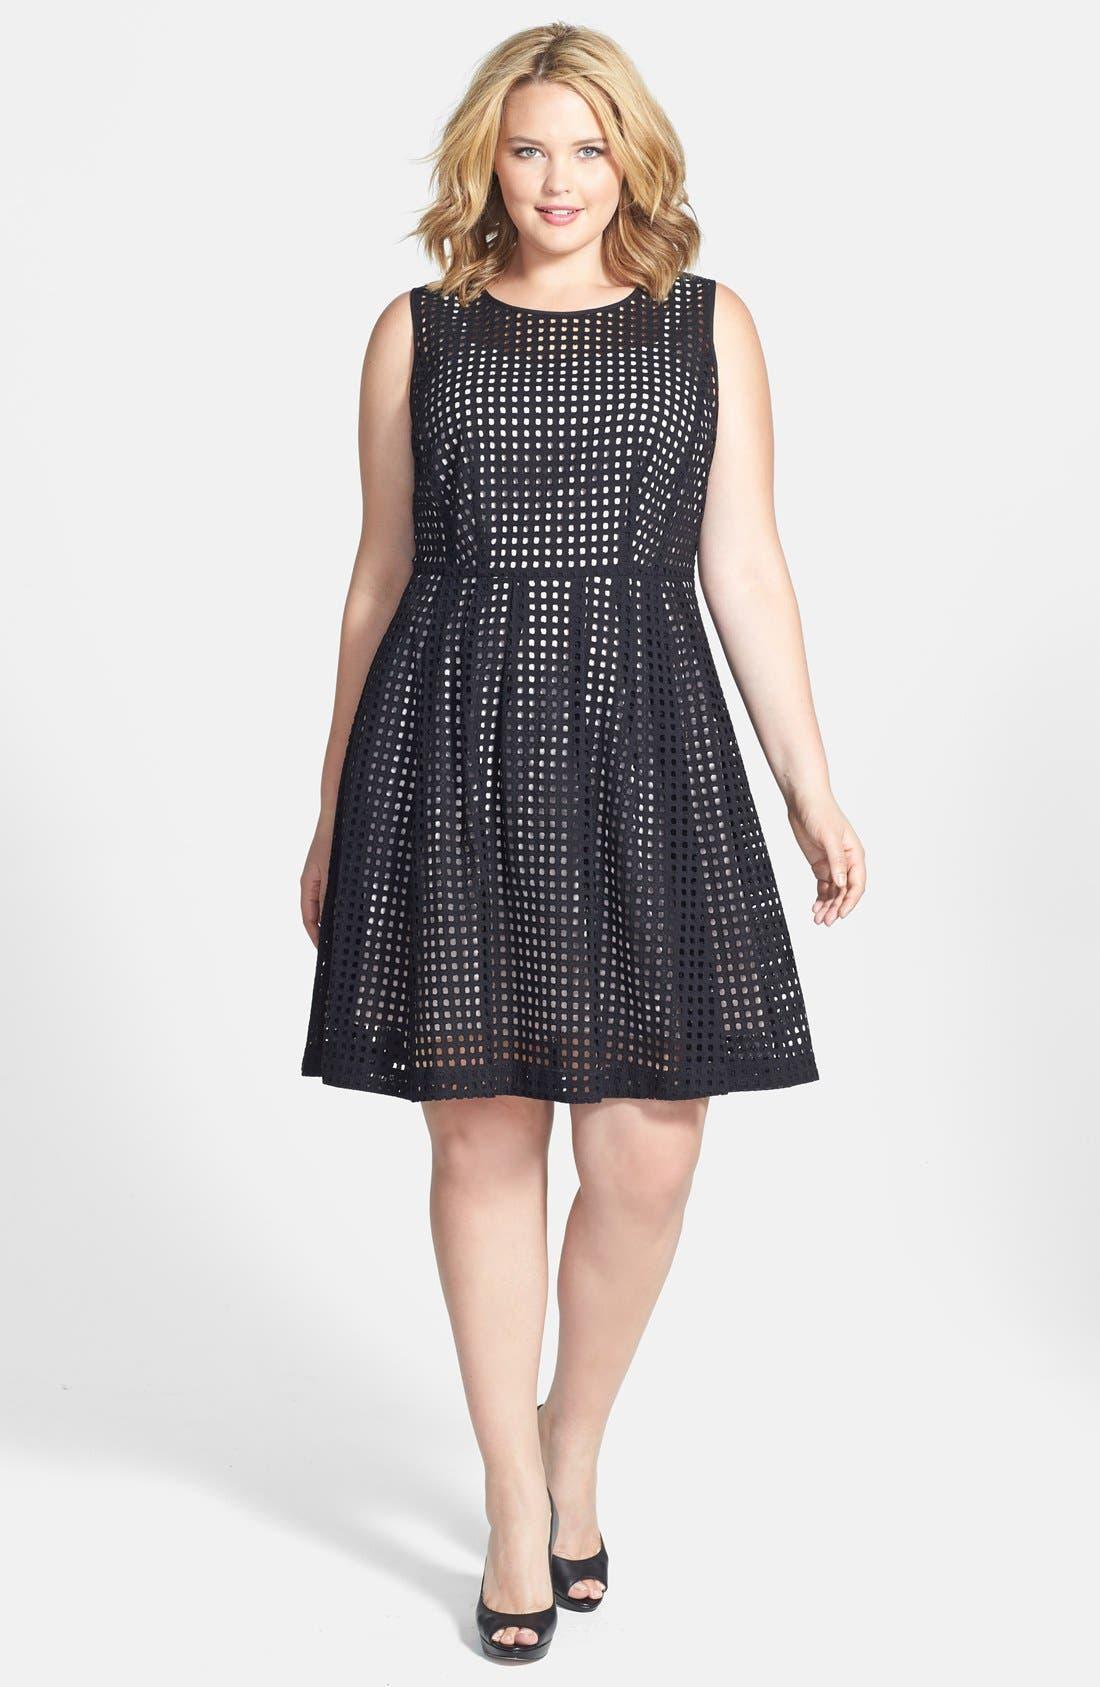 Alternate Image 1 Selected - Halogen® 'Prism' Eyelet Cotton Fit & Flare Dress (Plus Size)